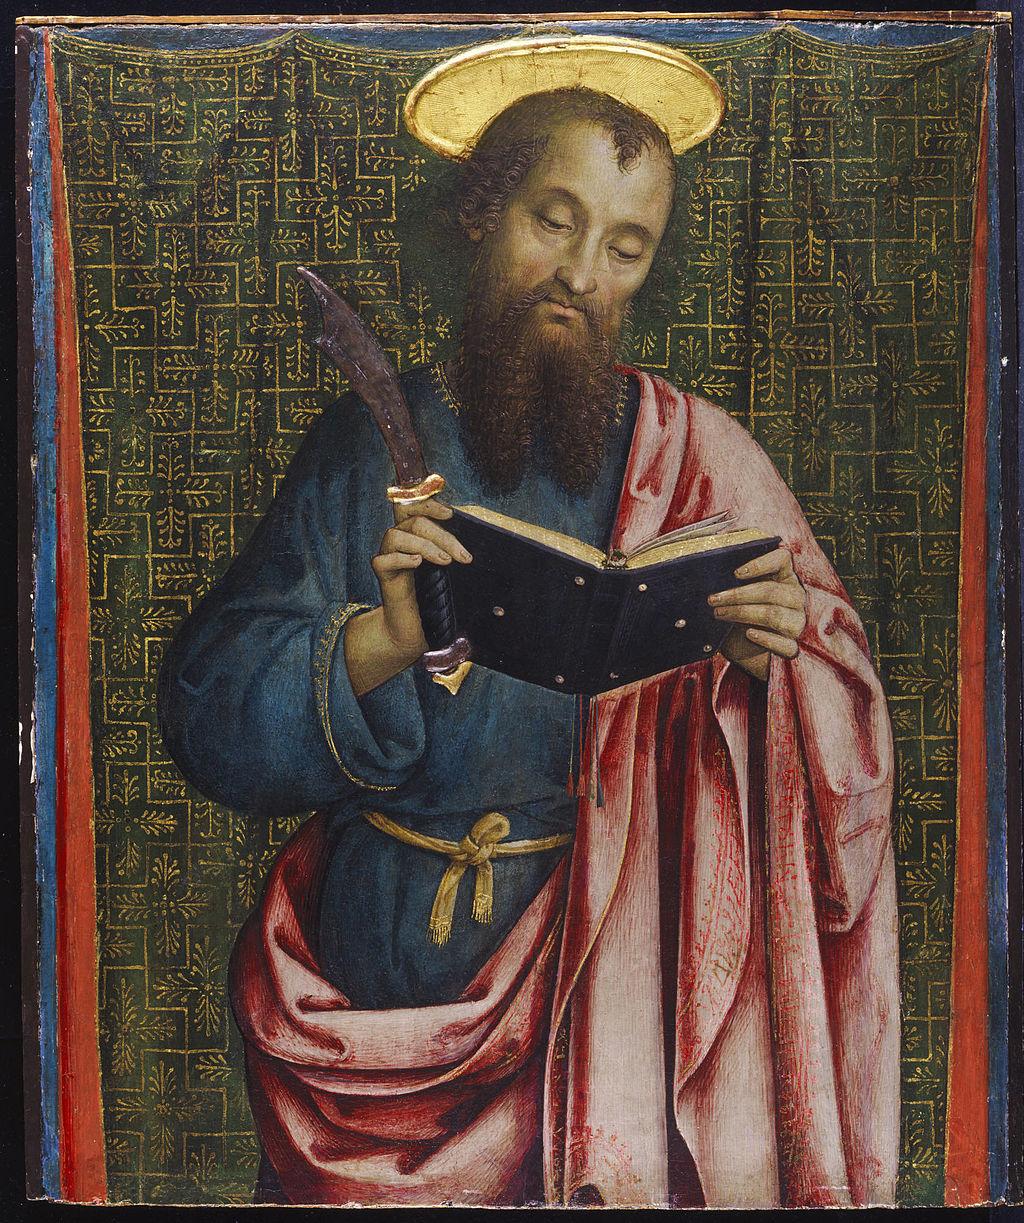 Pinturicchio (Bernardiono Di Betto), Saint Bartholomew, ca. 1497